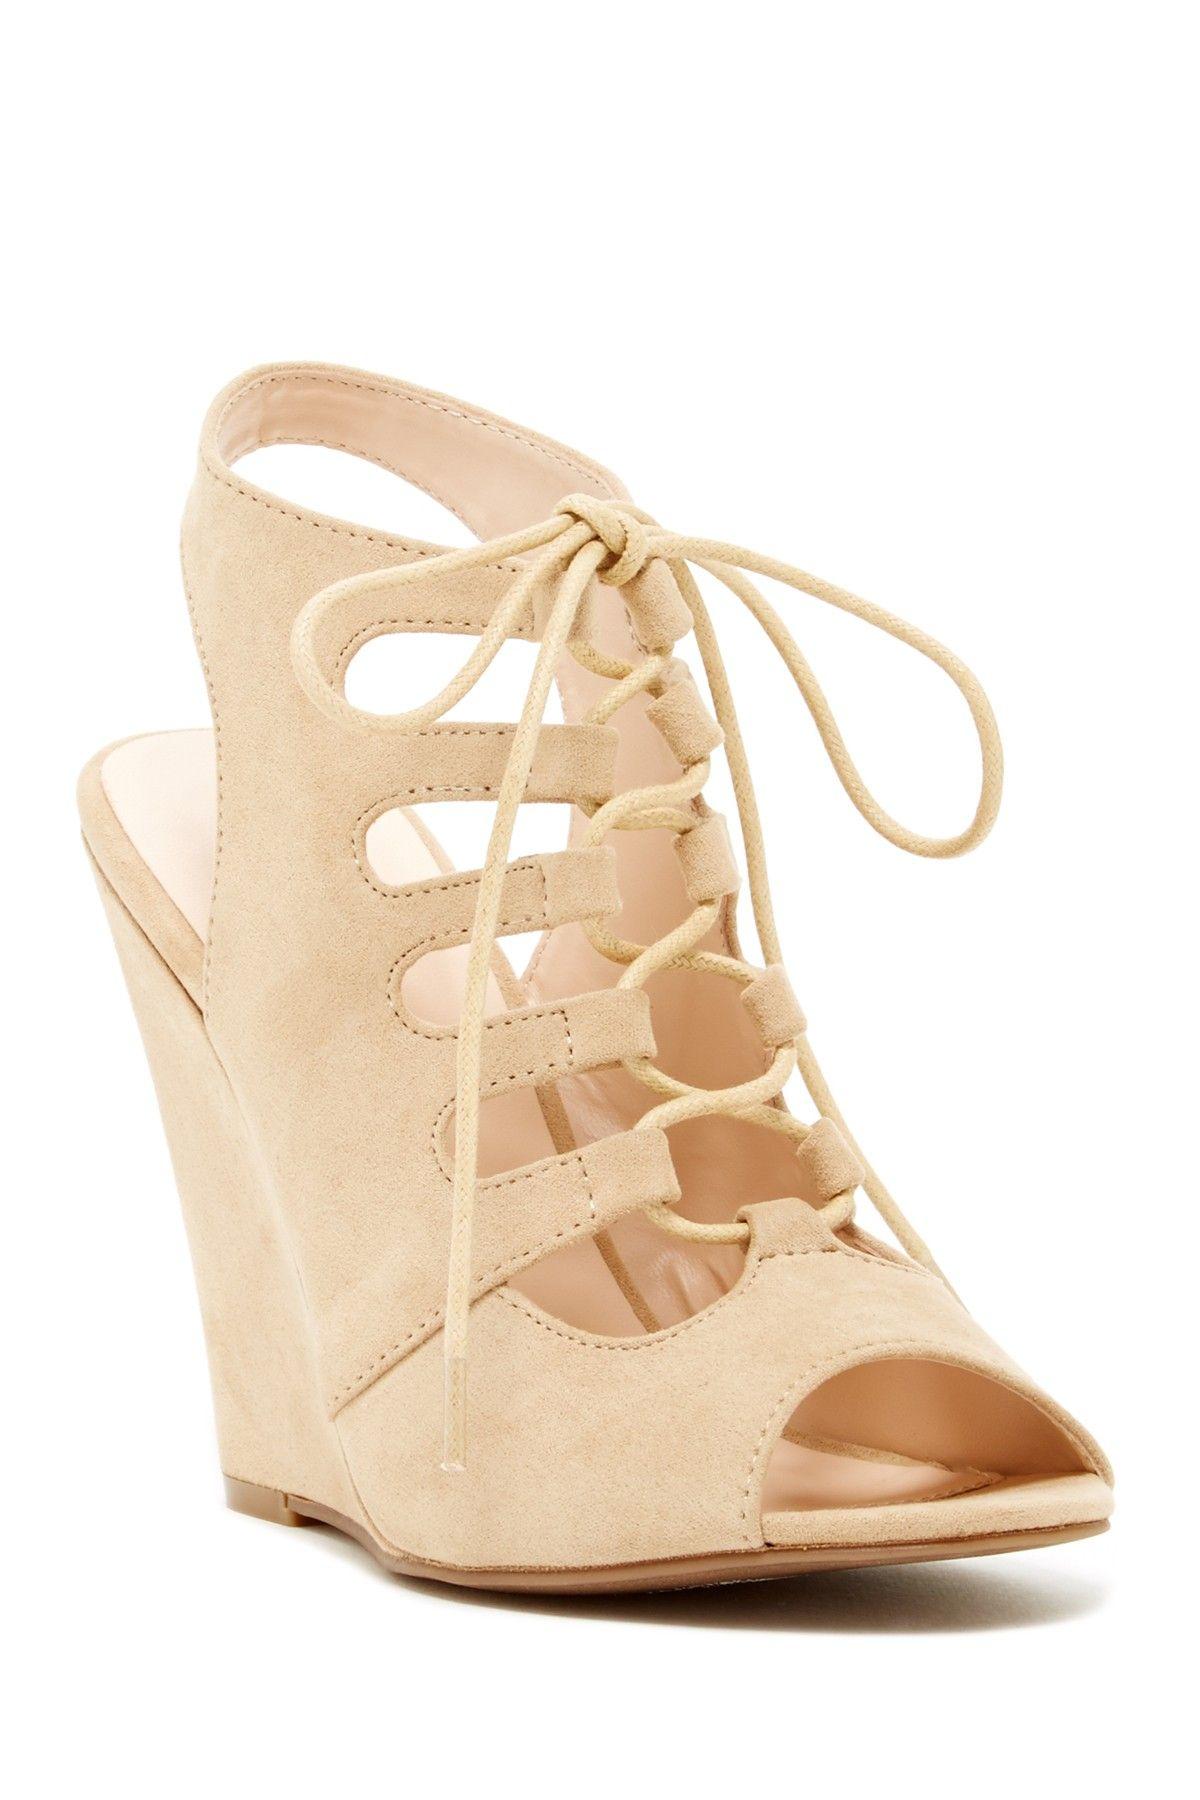 Wild Diva Lounge   Elisha Lace Up Sandale Sandale Up   Legend footwear, Footwear ... 2b03e9